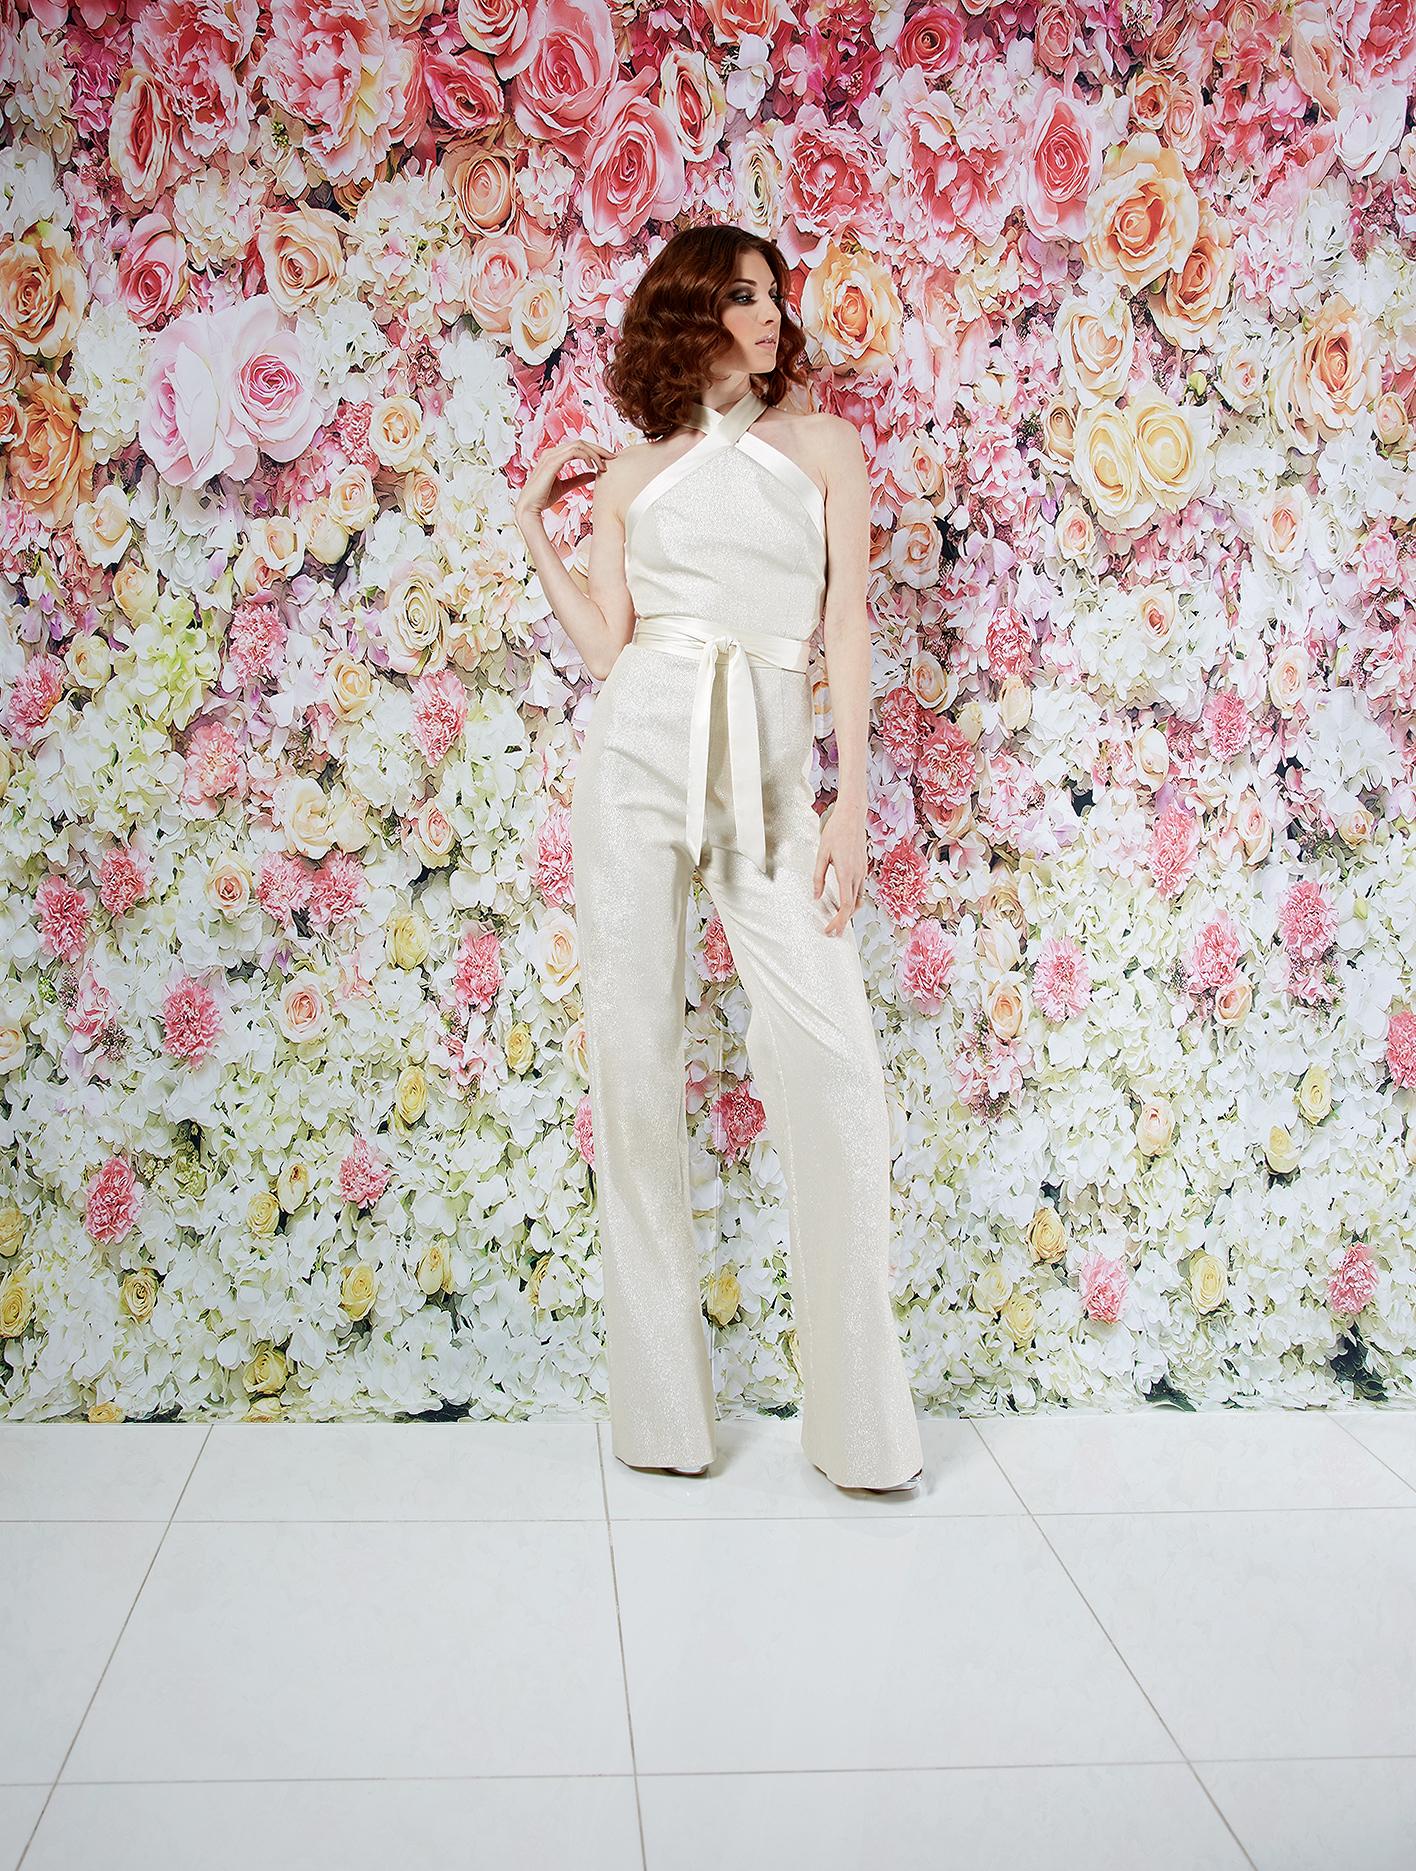 randi rahm wedding dress spring 2019 sparkly halter jumpsuit